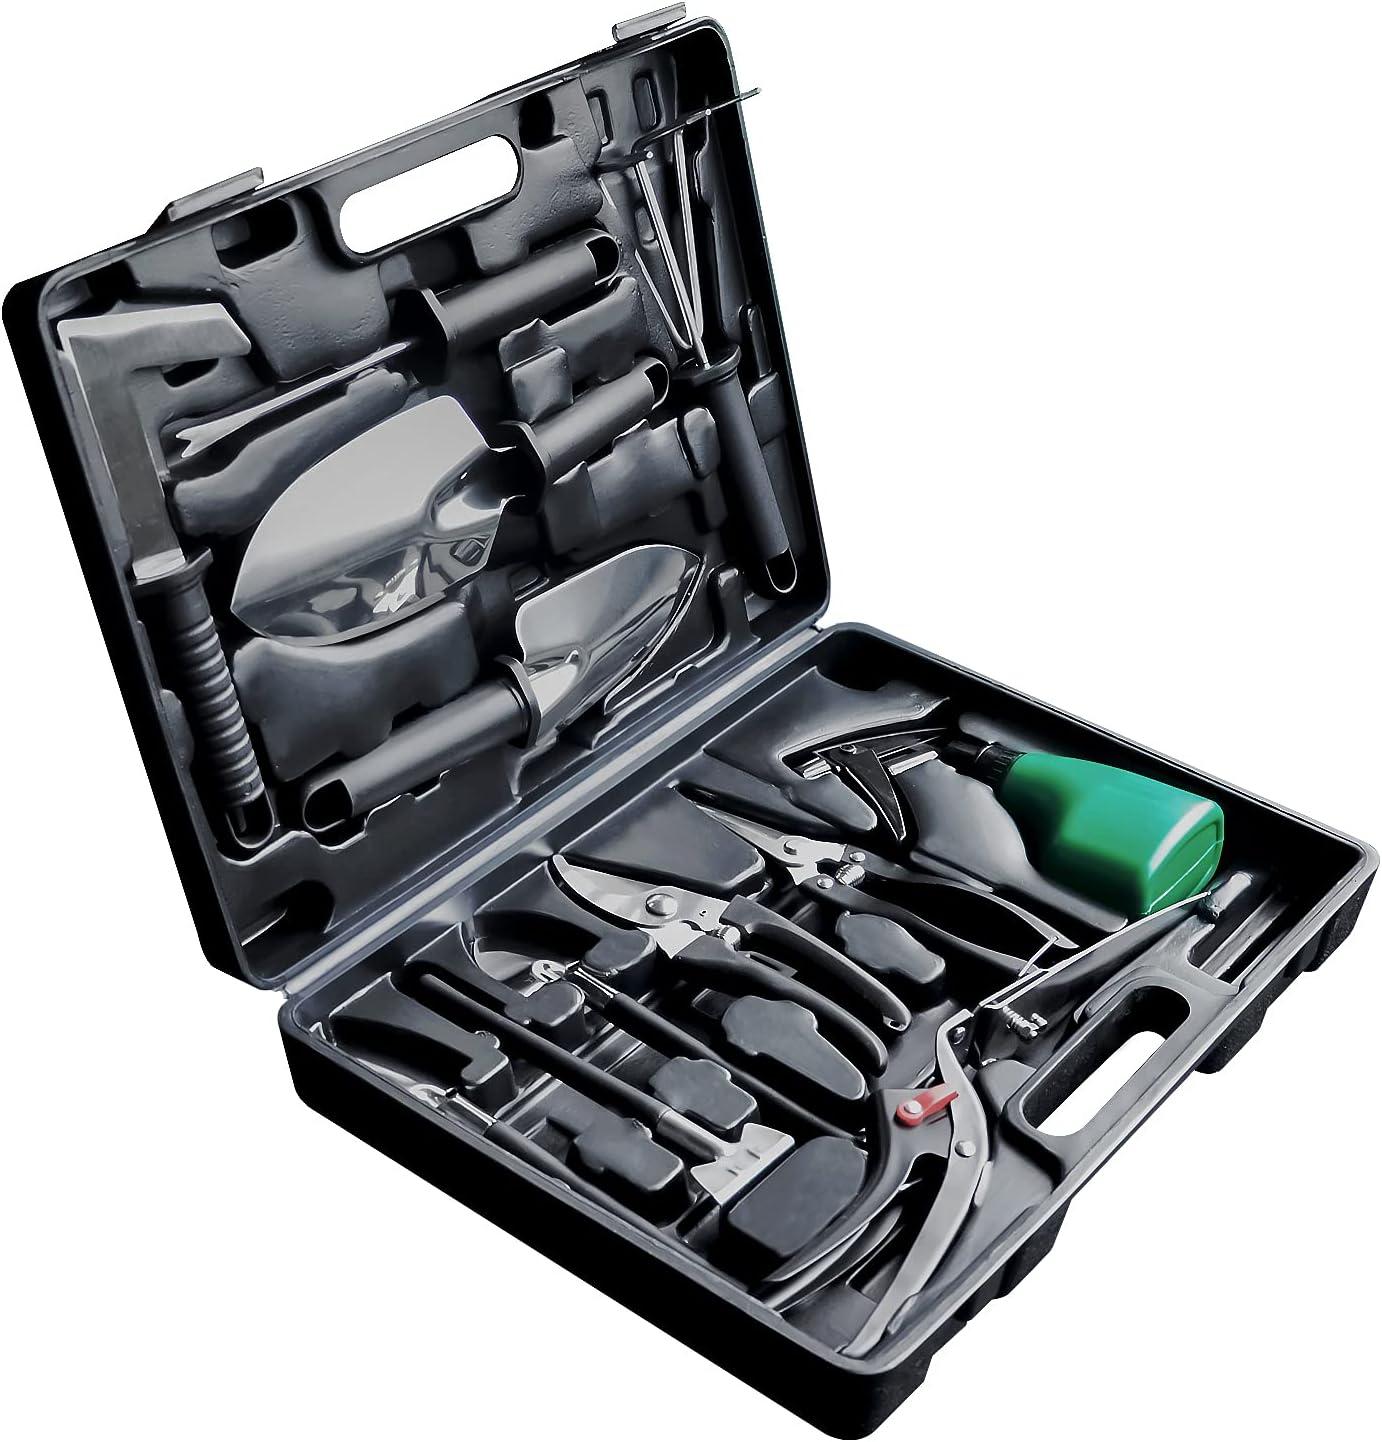 Garden Tool Set, 13 Piece Stainless Steel Heavy Duty Gardening Tool Set, Gardening Tools for Women/Men (Black)